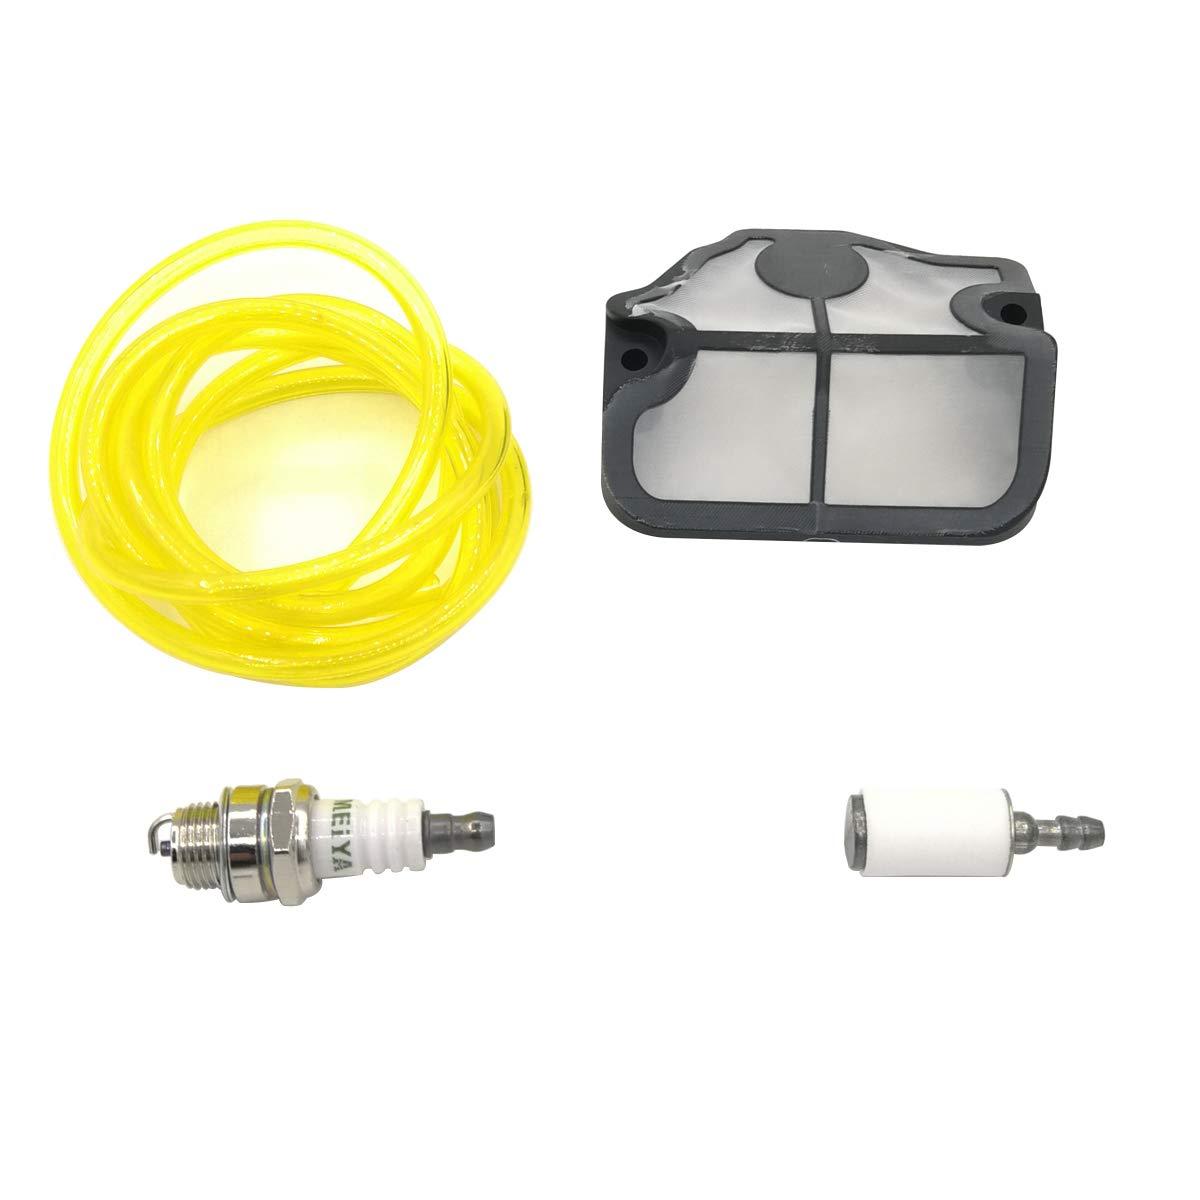 Shioshen Aria Filtro Carburante Tubo Flessibile Kit Candele per Husqvarna 136 41 36 Le 141 Le 137 e 142 e Motosega